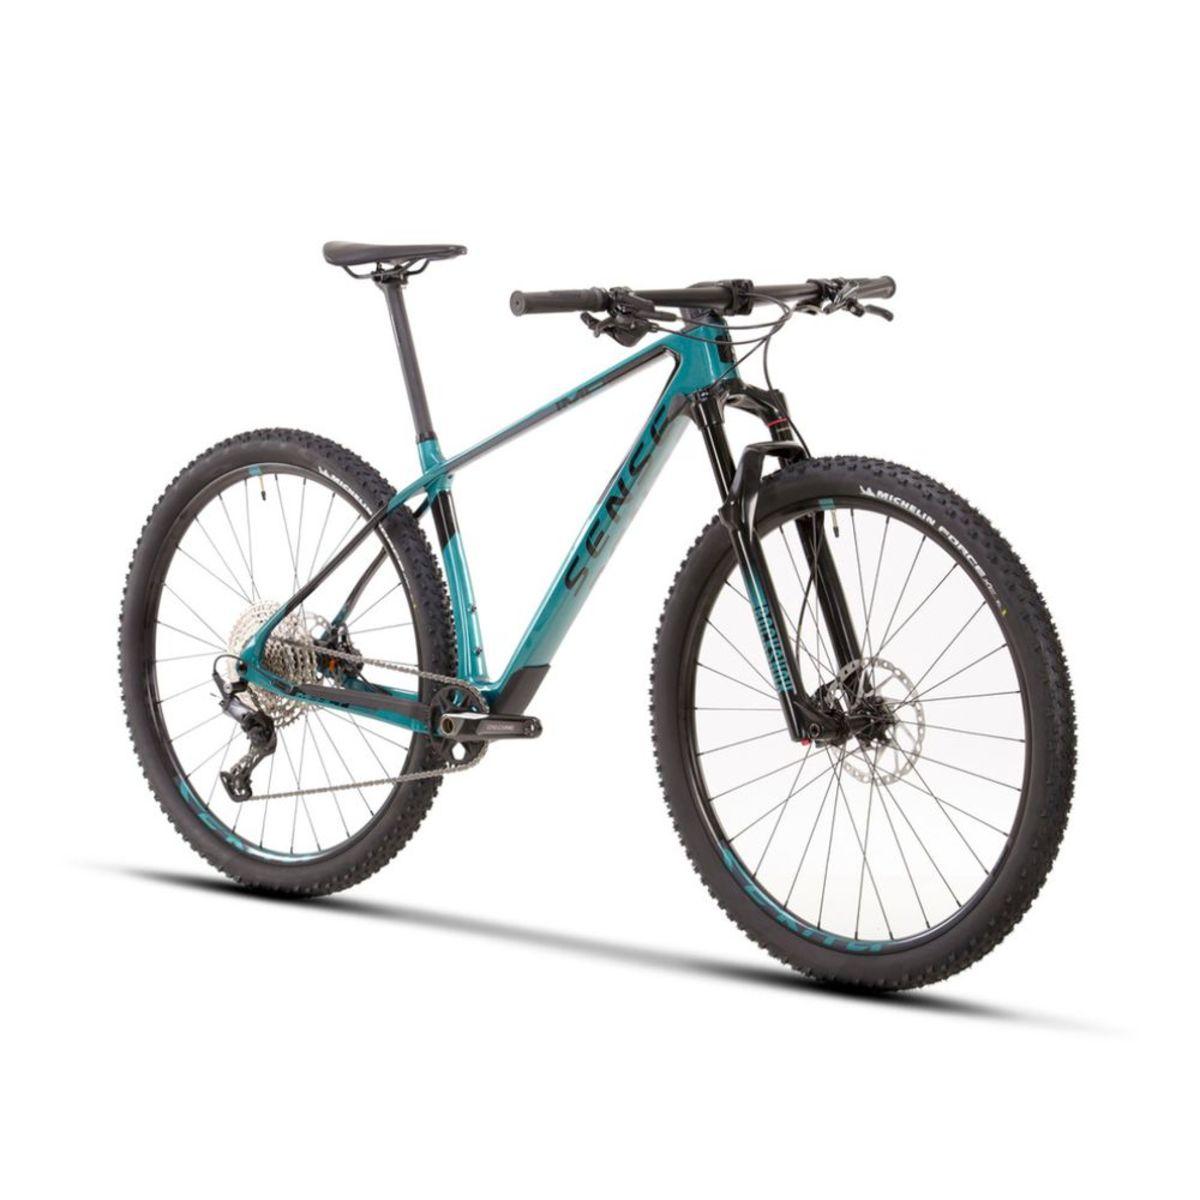 BICICLETA SENSE 29 IMPACT CARBON PRO 2021/22 Verde